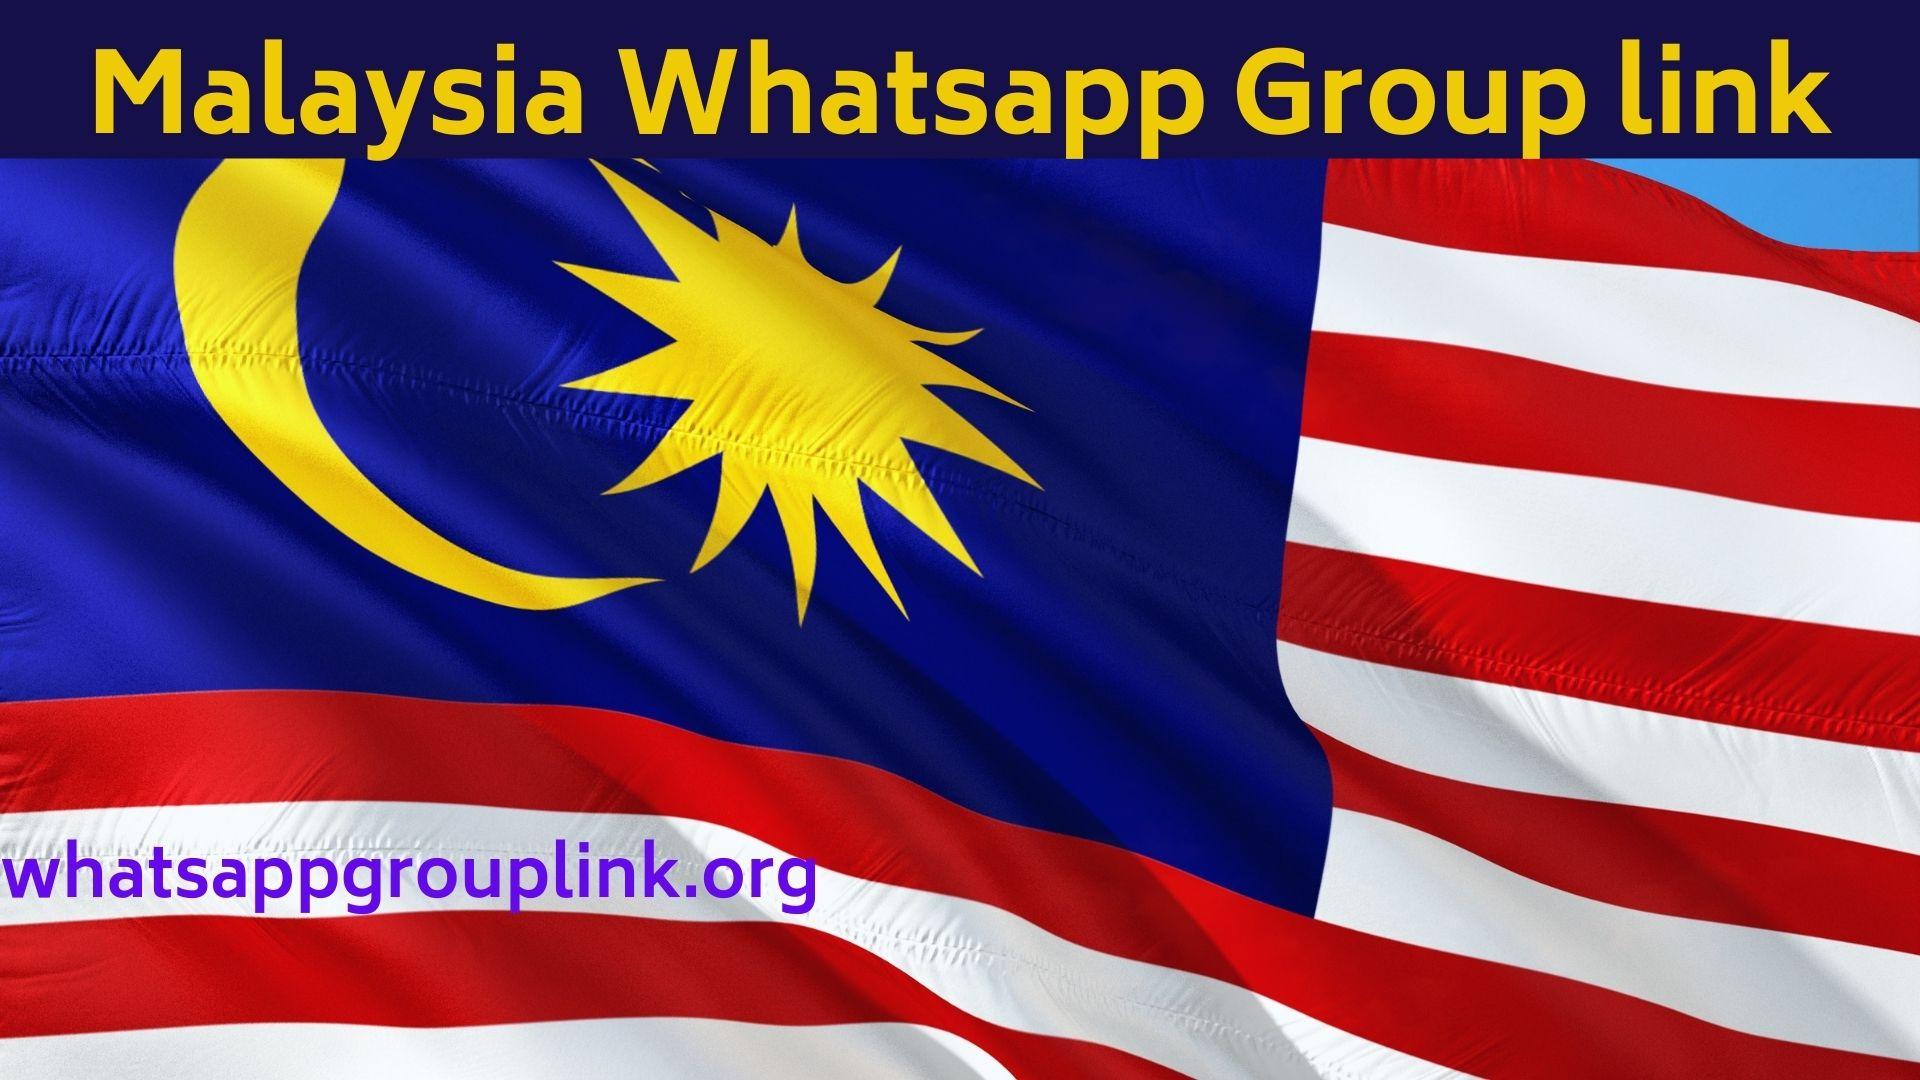 Malaysia Whatsapp Group Link Whatsapp Group Links